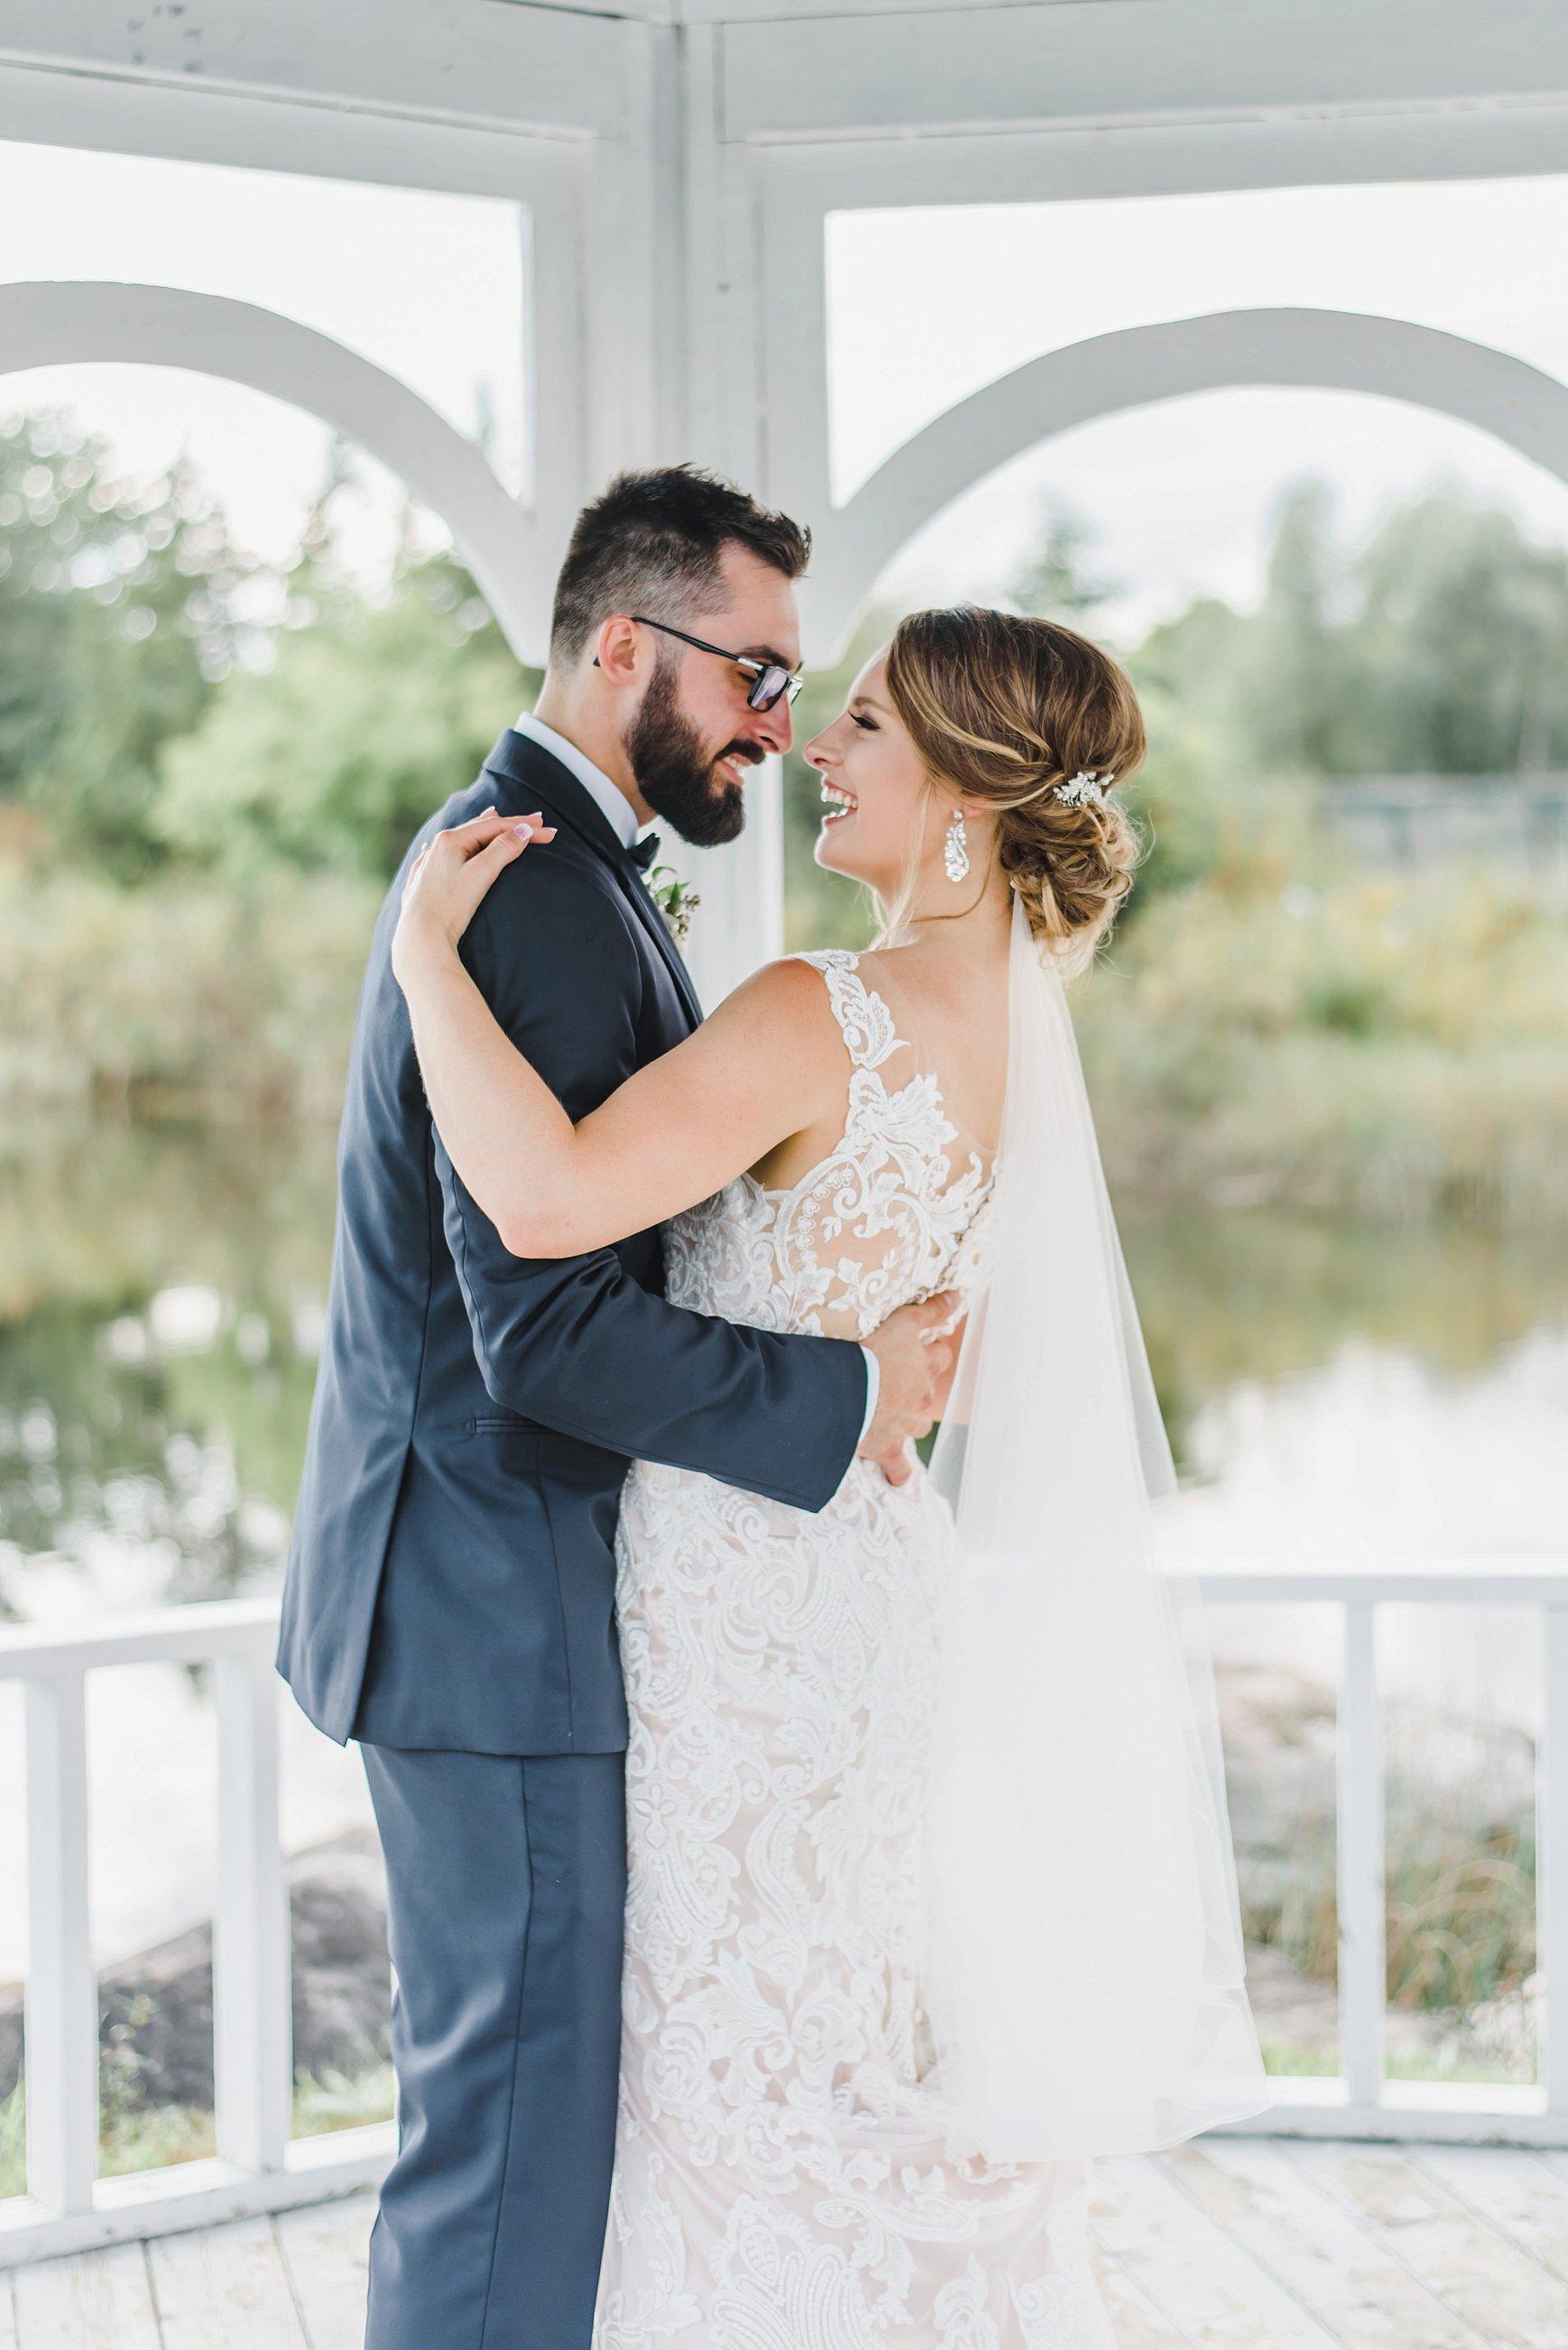 light airy indie fine art ottawa wedding photographer | Ali and Batoul Photography_1297.jpg